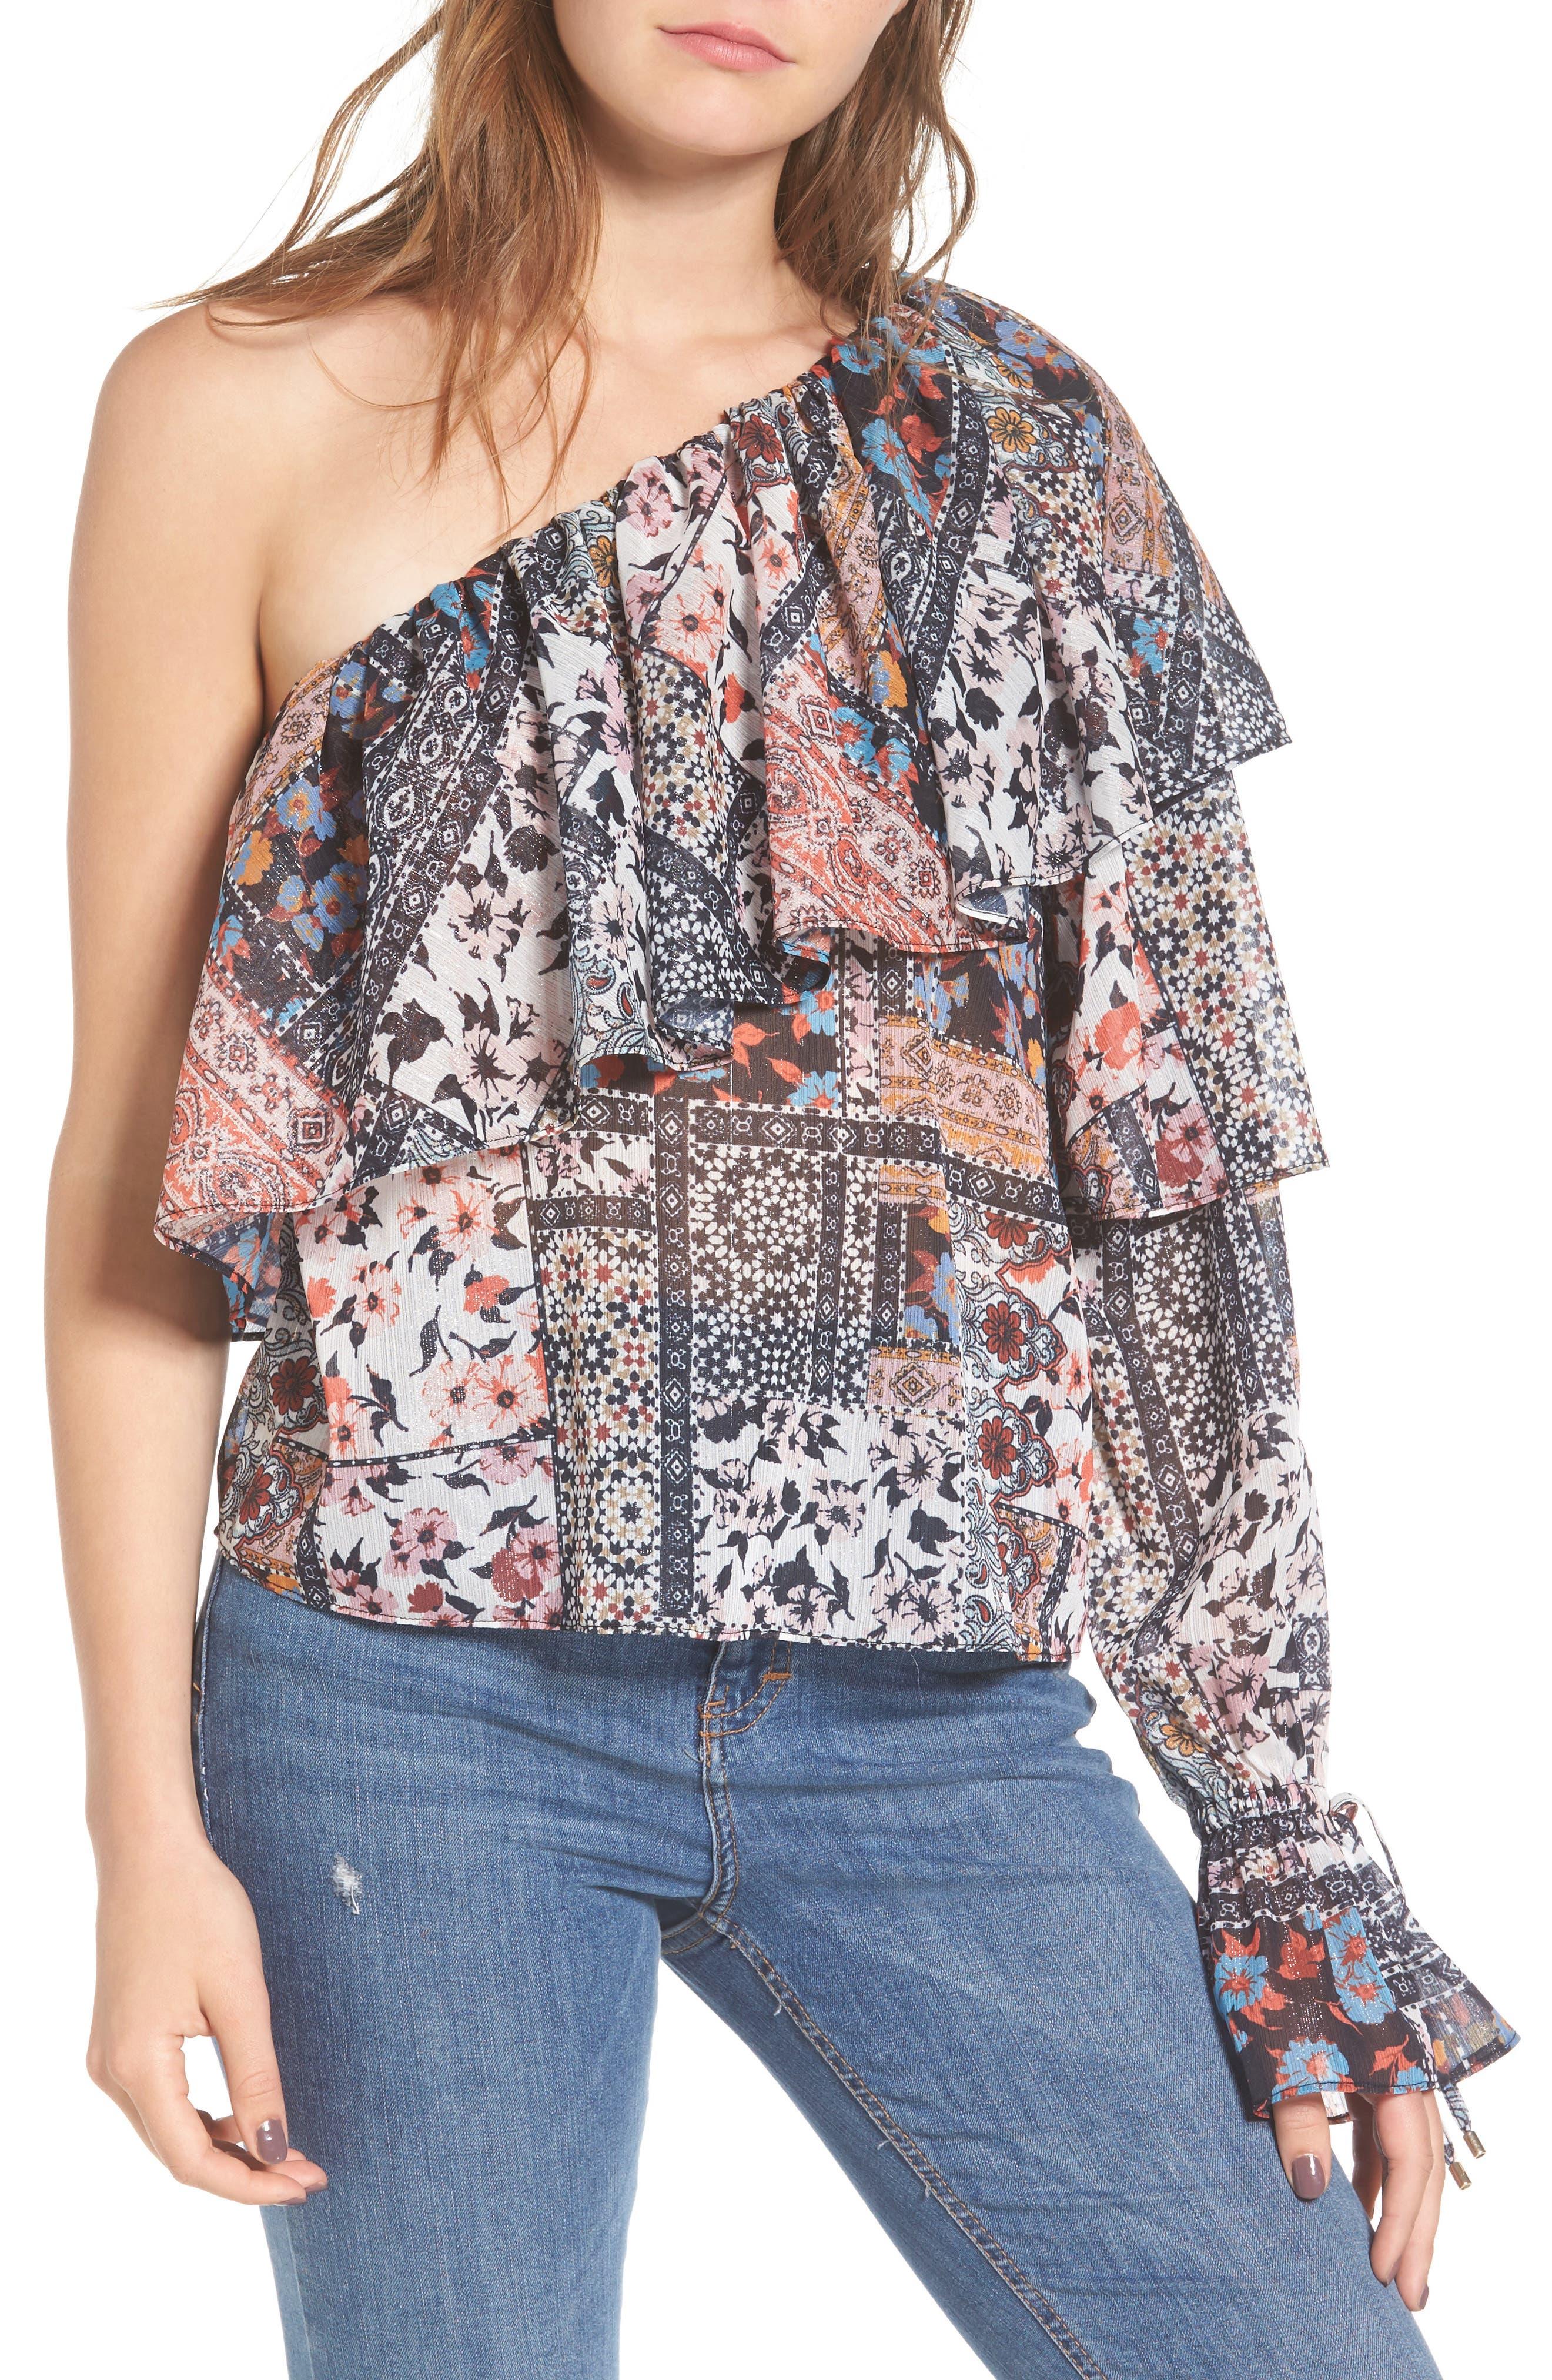 Madora One-Shoulder Blouse,                         Main,                         color, Patchwork